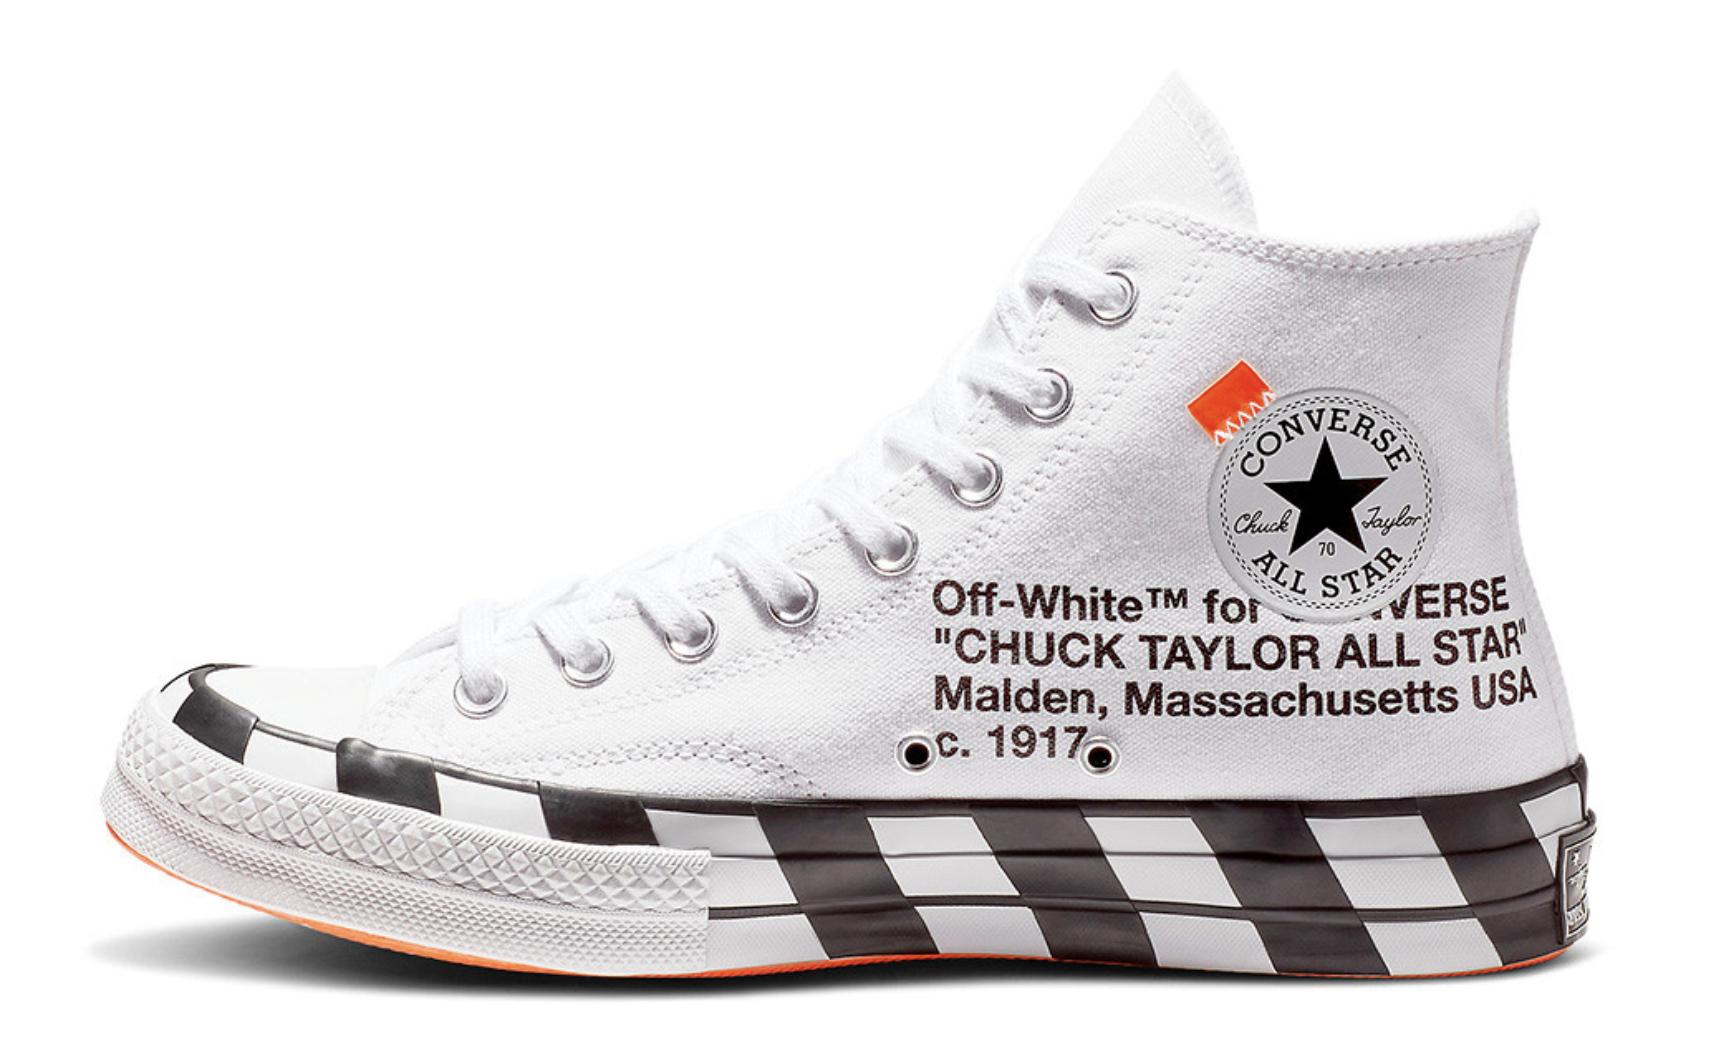 6898cd487b8a0d Converse Chuck Taylor All-Star 70s Hi Off-White